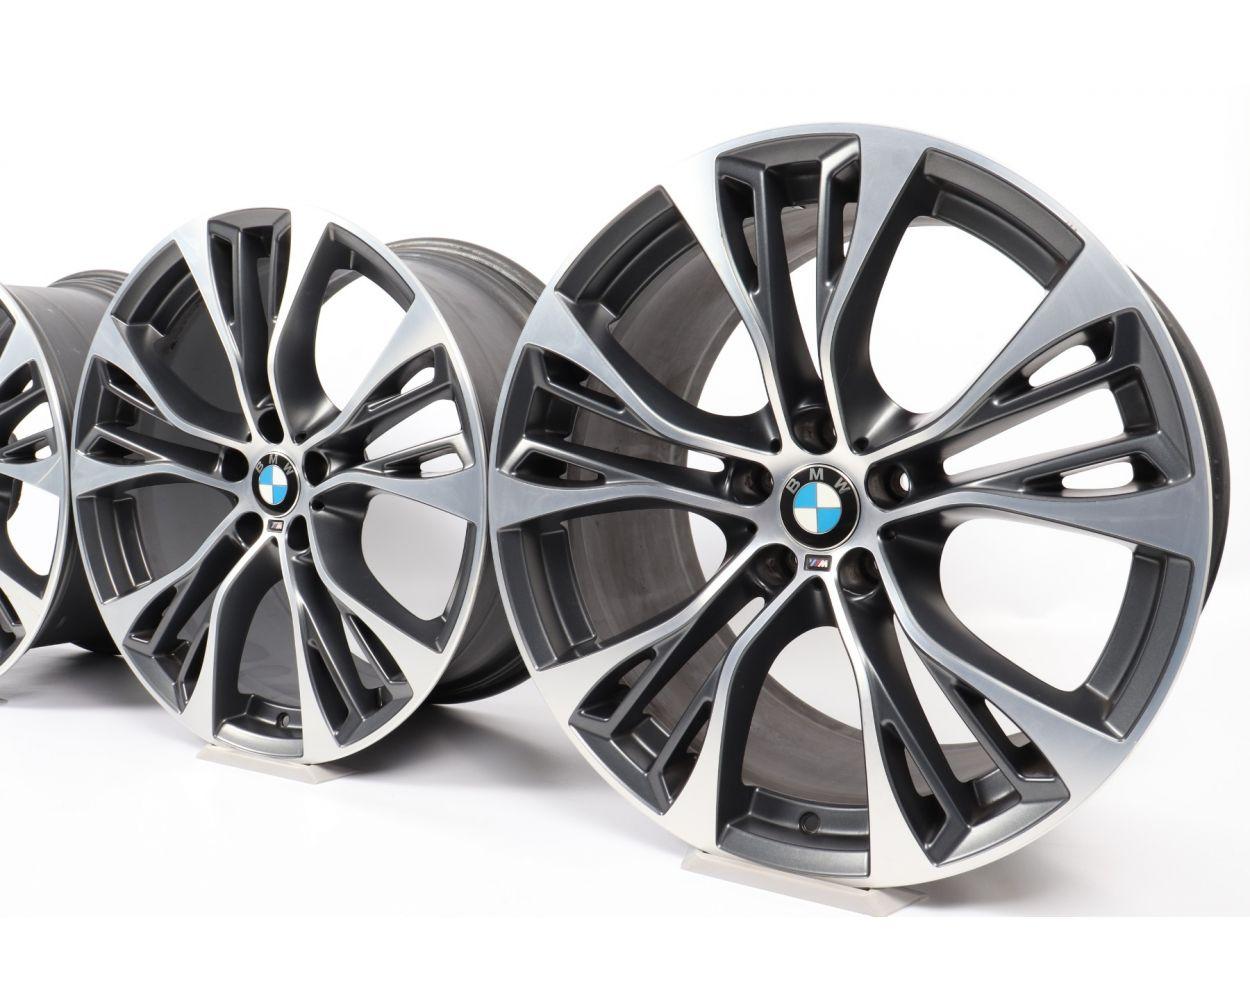 4x Bmw Alloy Rims X5 F15 X6 F16 21 Inch Styling 599 M Double Spoke